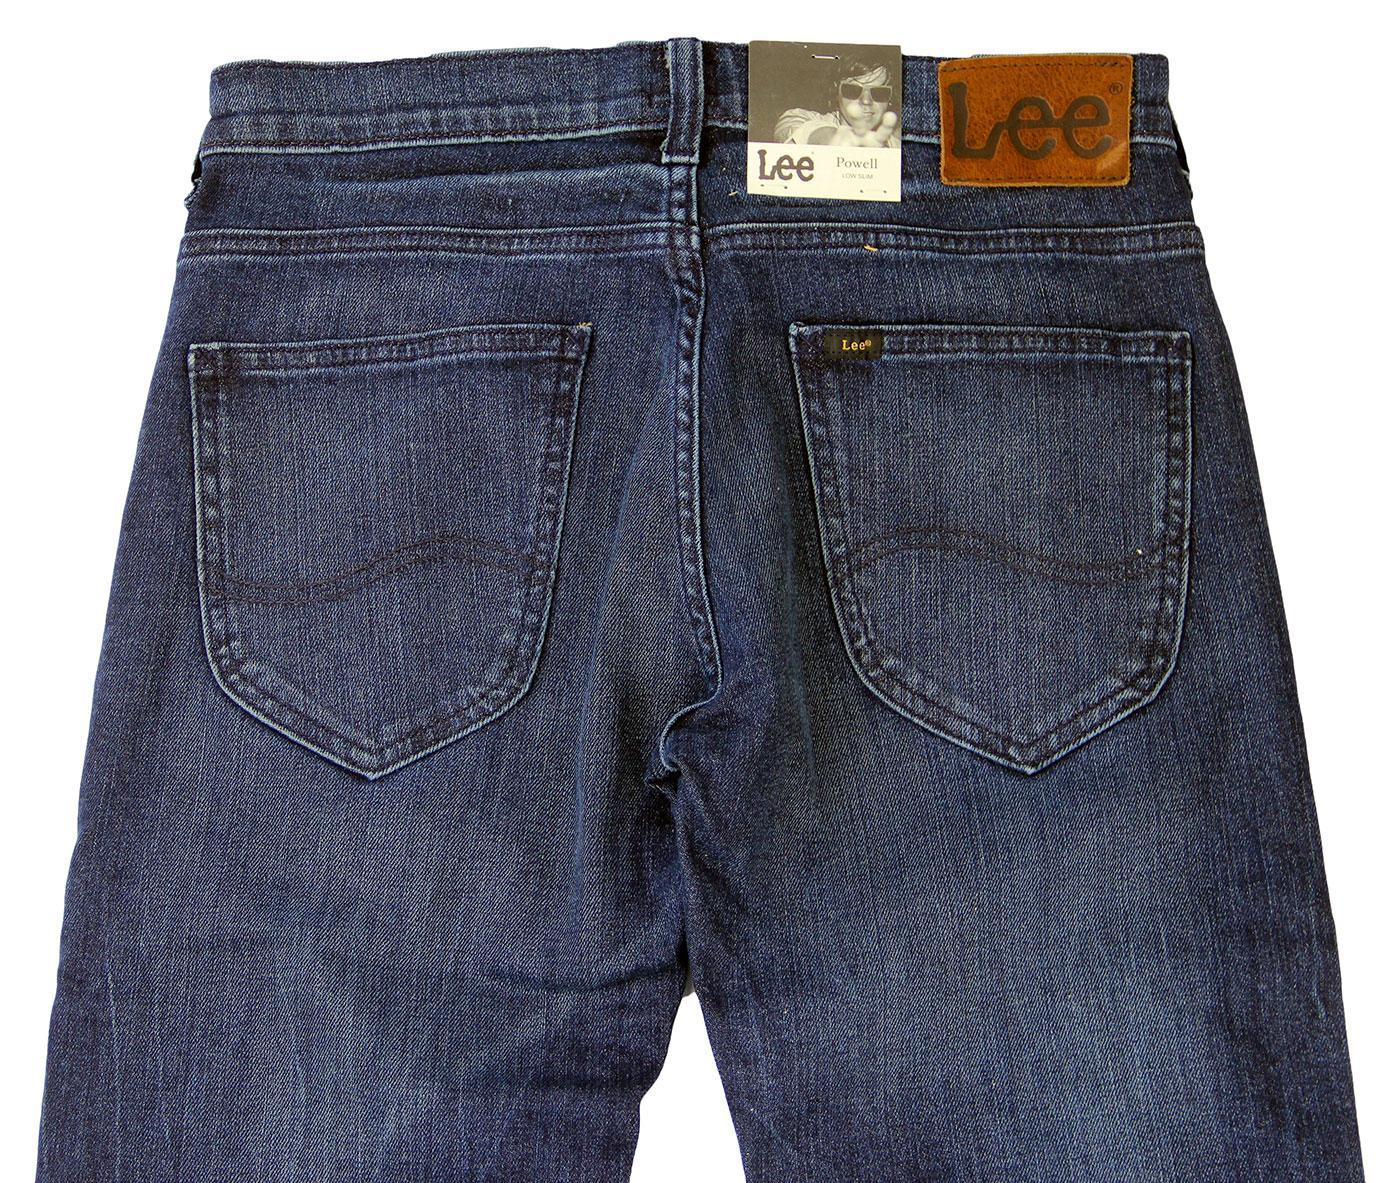 2936c3ed LEE JEANS Powell Retro Mod Low Slim Fit Jeans Night Sky Blue